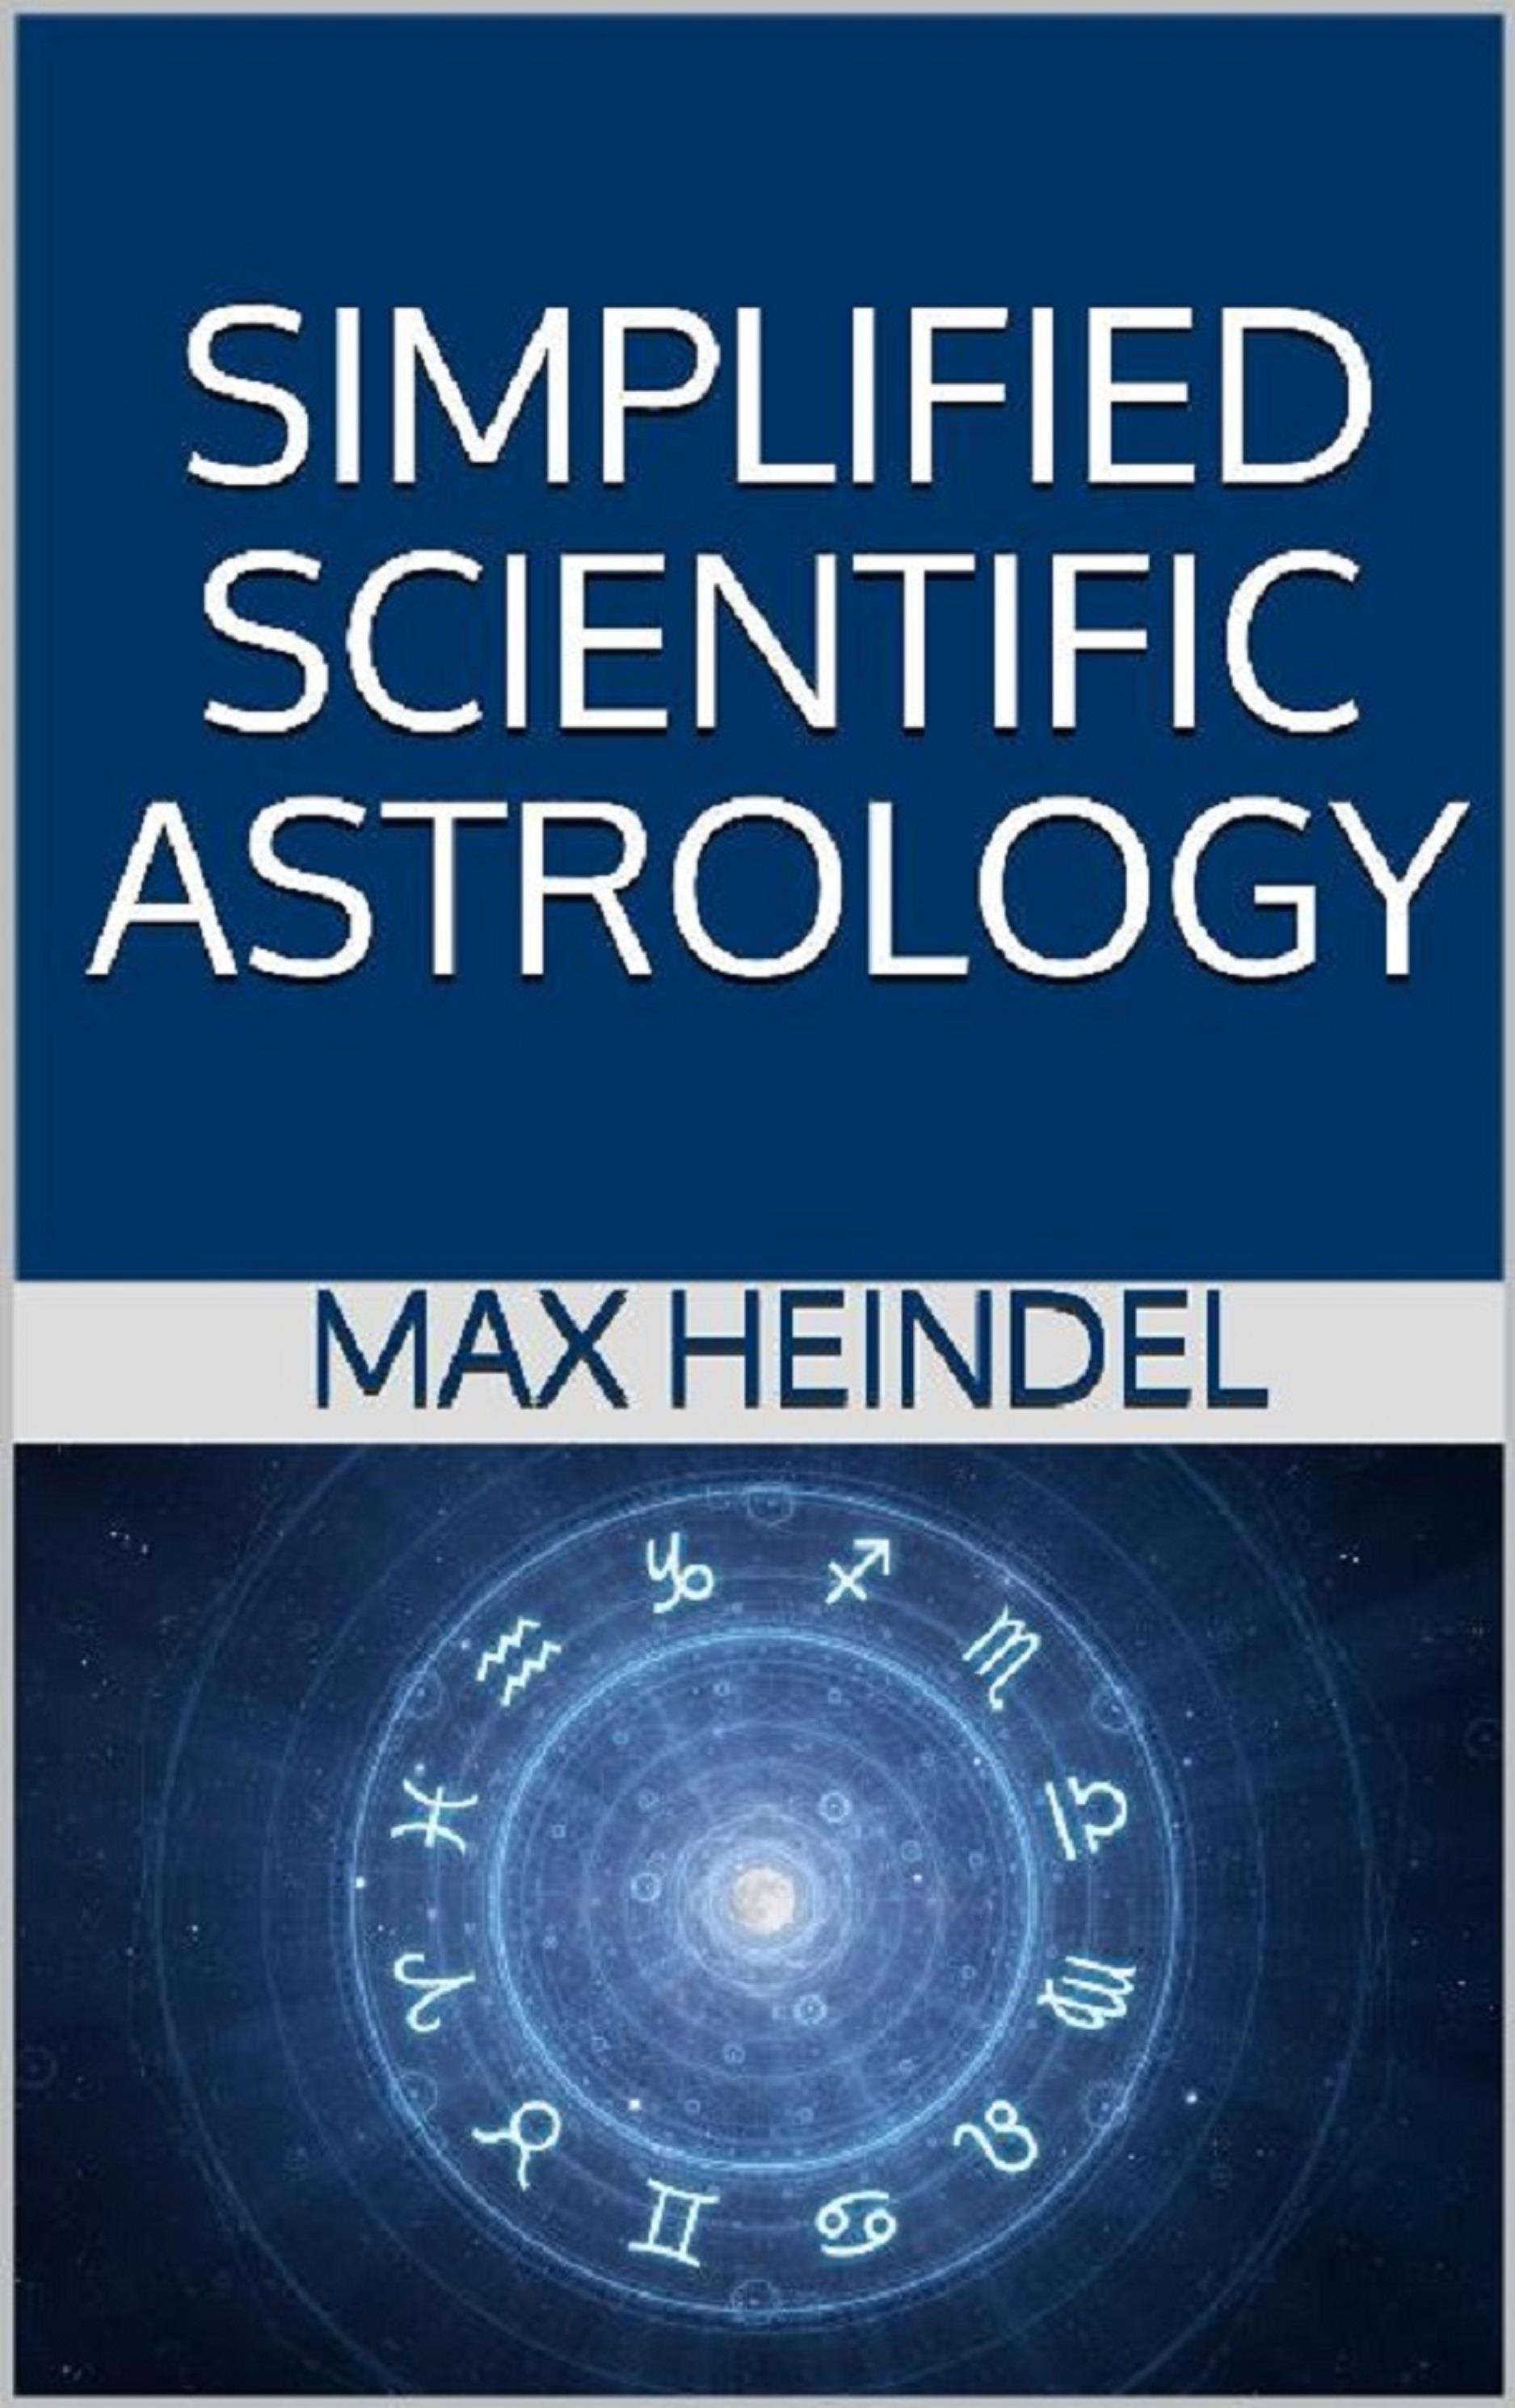 Simplified Scientific Astrology